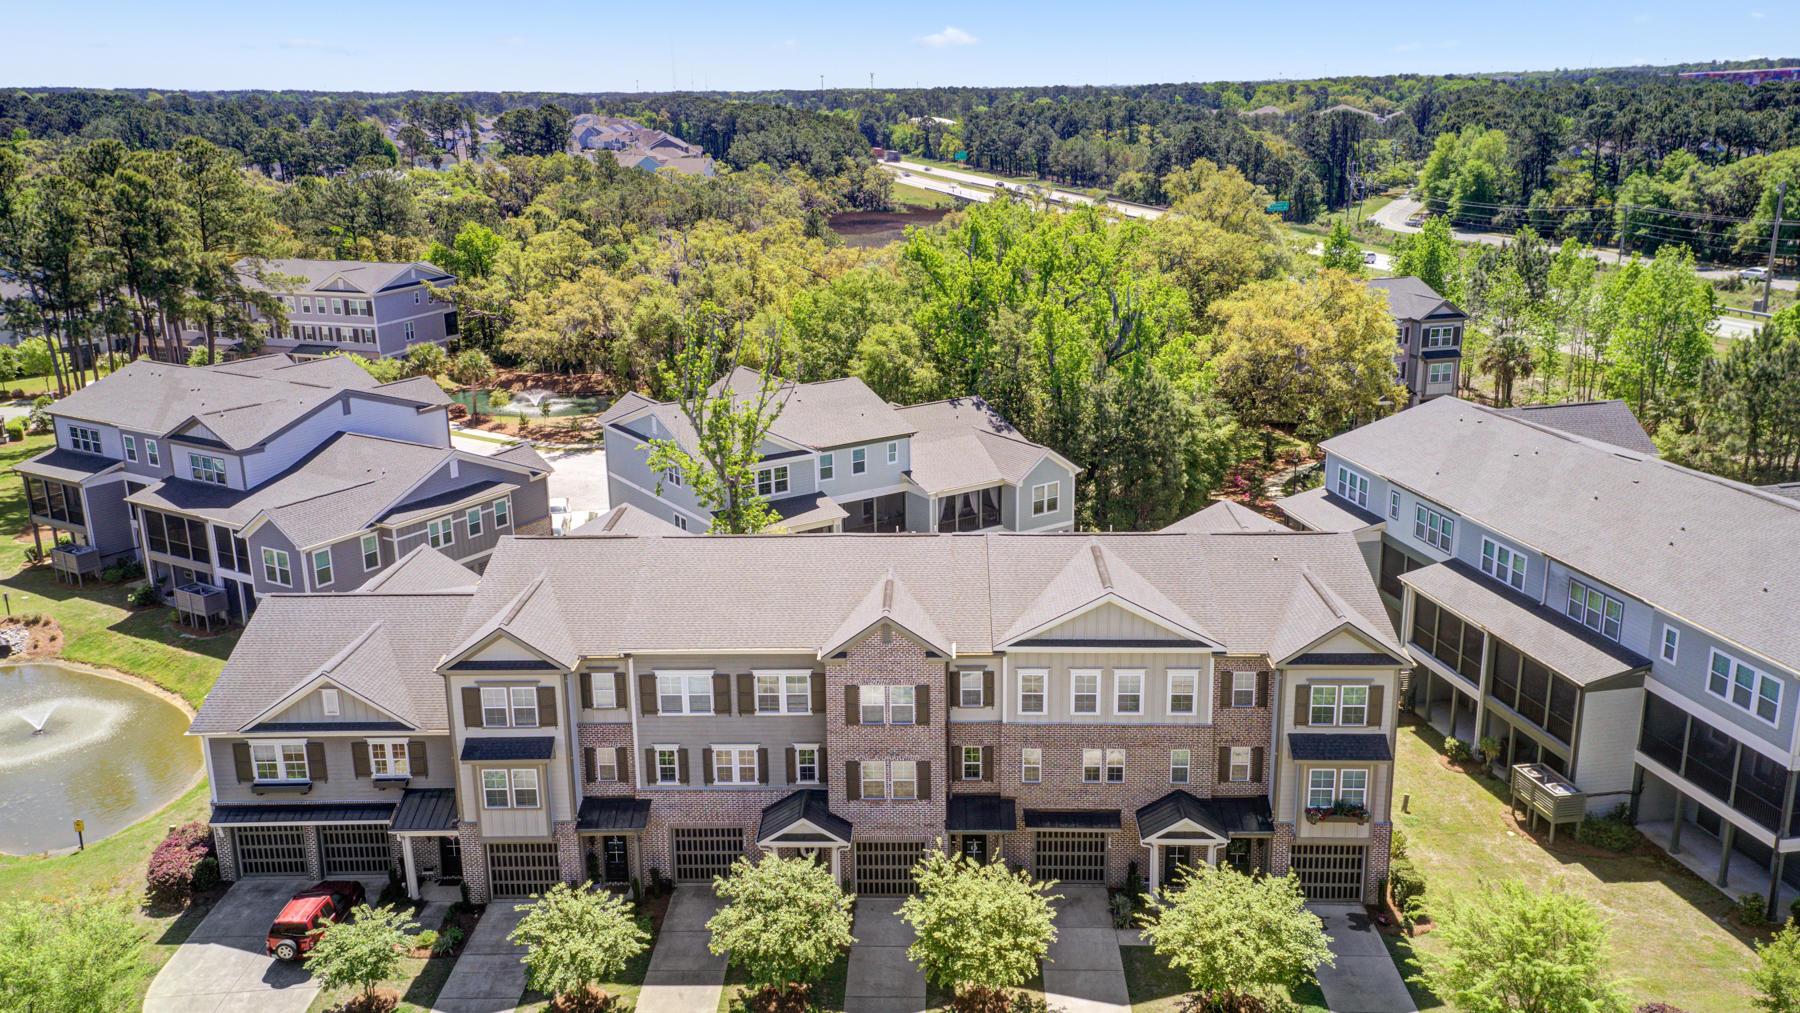 Etiwan Pointe Homes For Sale - 254 Slipper Shell, Mount Pleasant, SC - 26